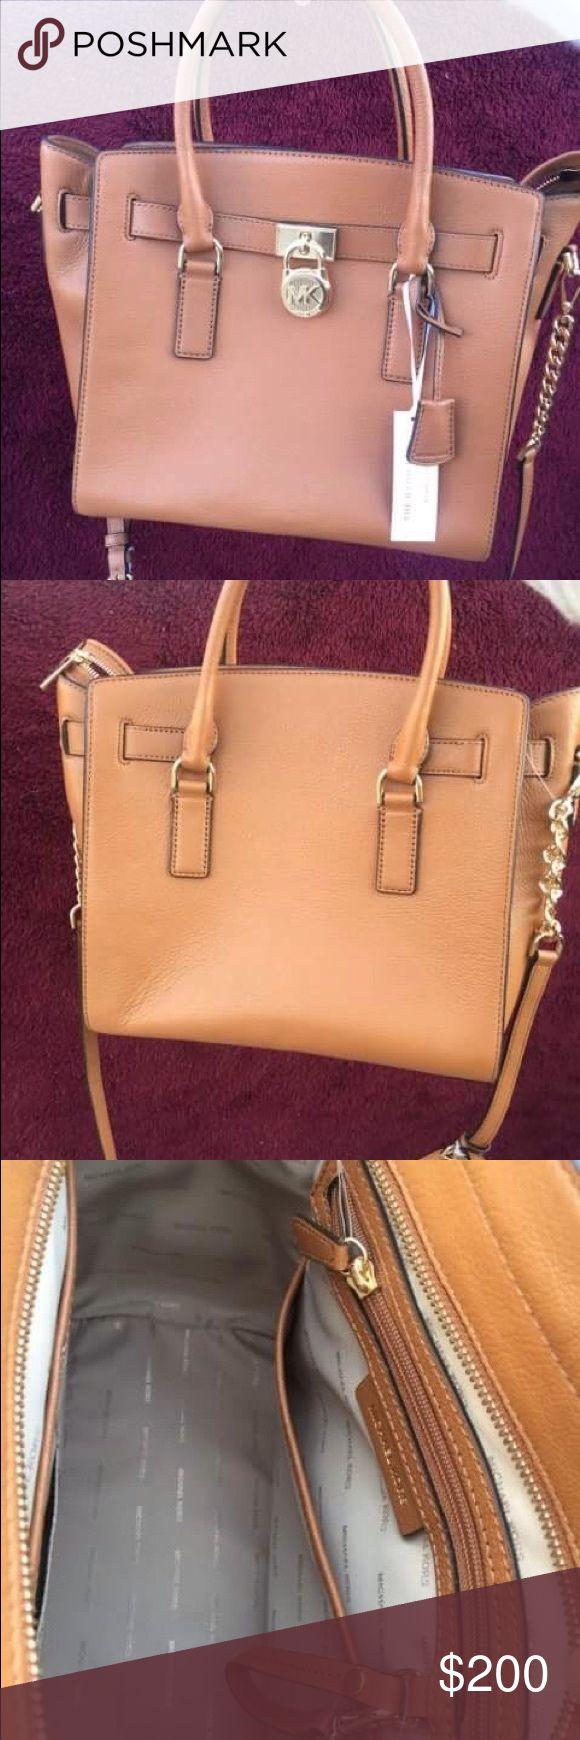 Michael Kors Handbag MICHAEL Michael Kors Studio Hamilton Large East West Satchel   Never been used. Brand new! Michael Kors Bags Satchels